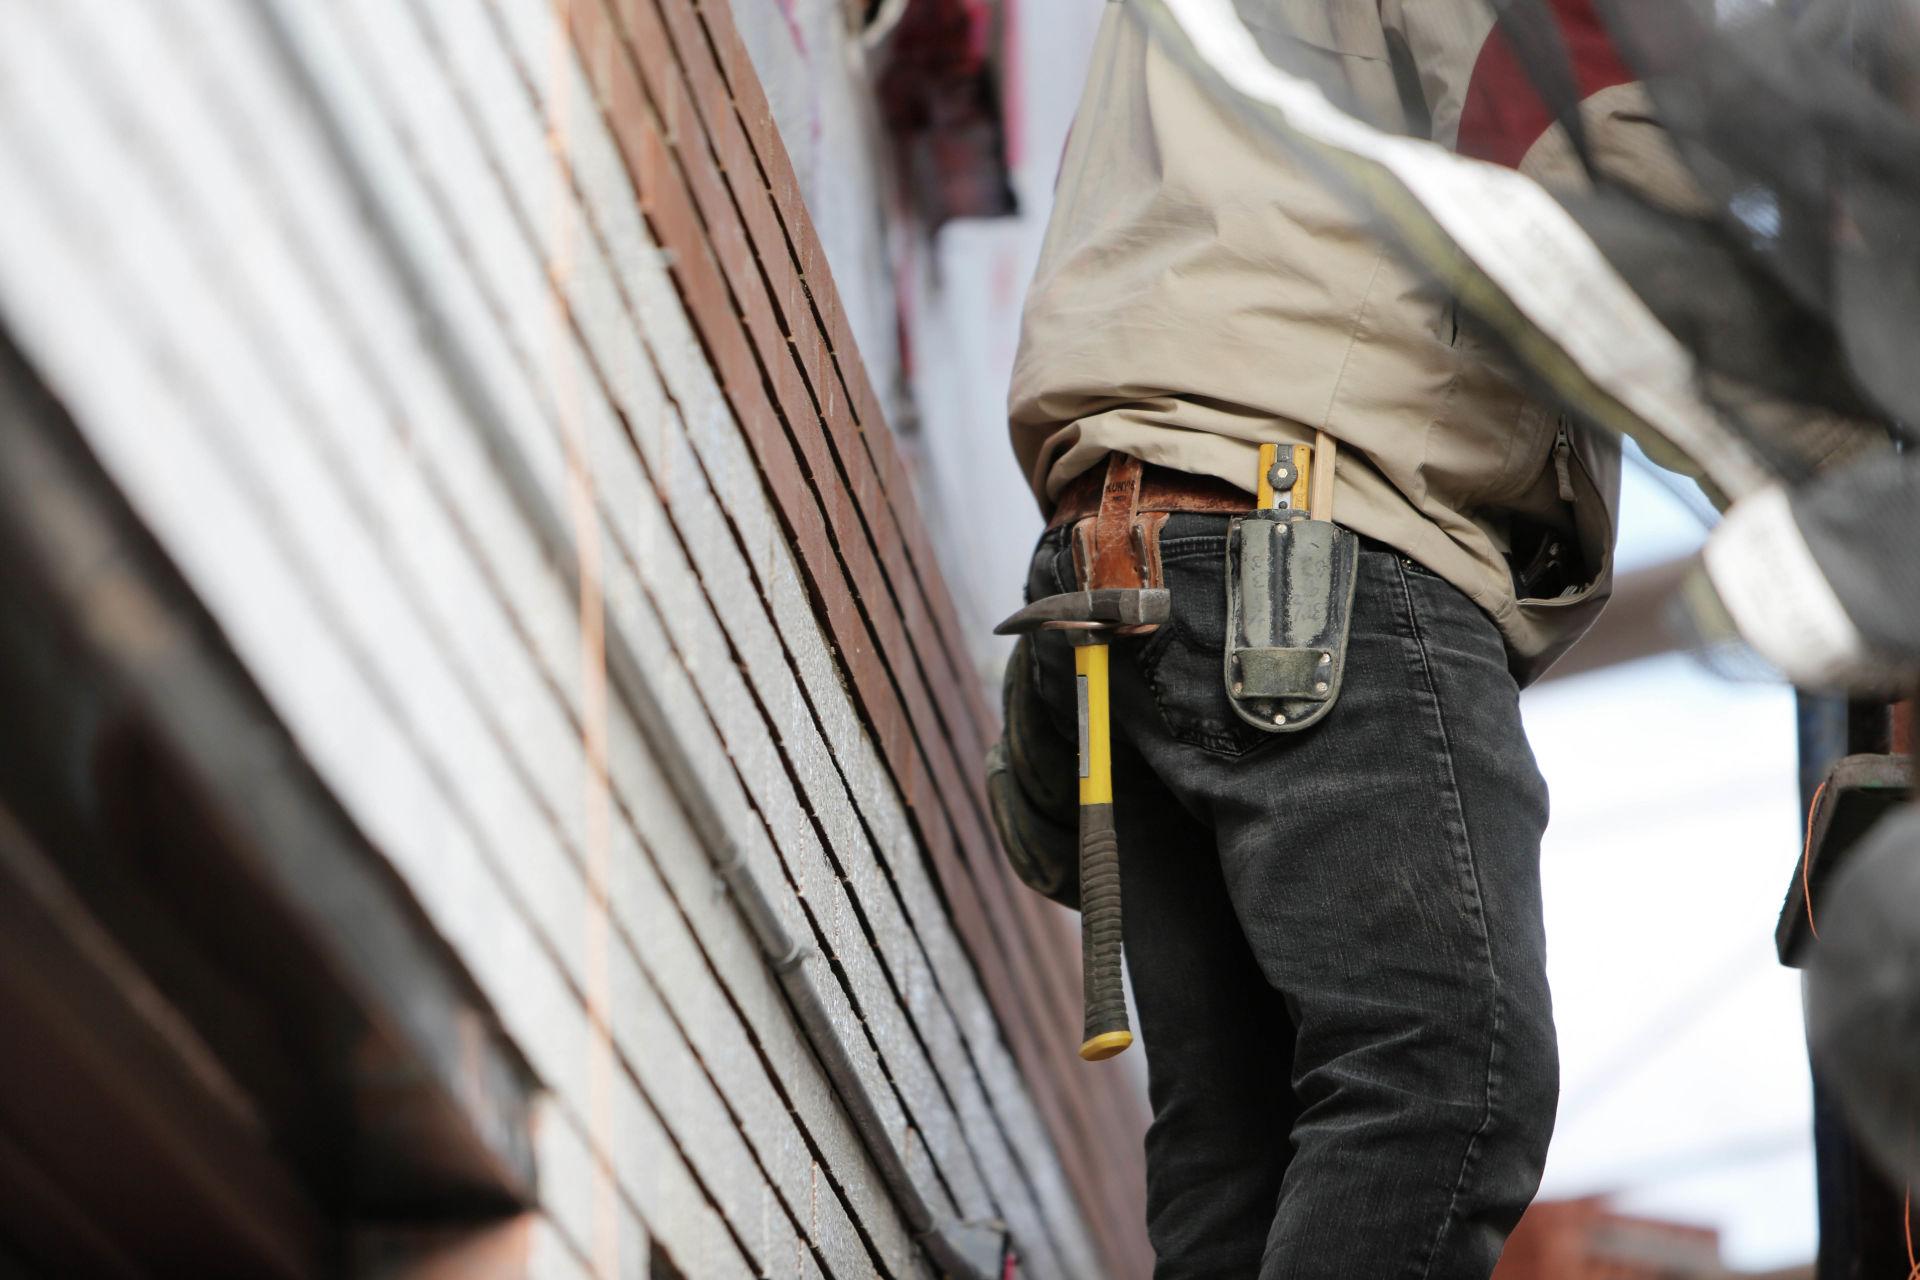 Annual Northern Illinois Home Maintenance Checklist